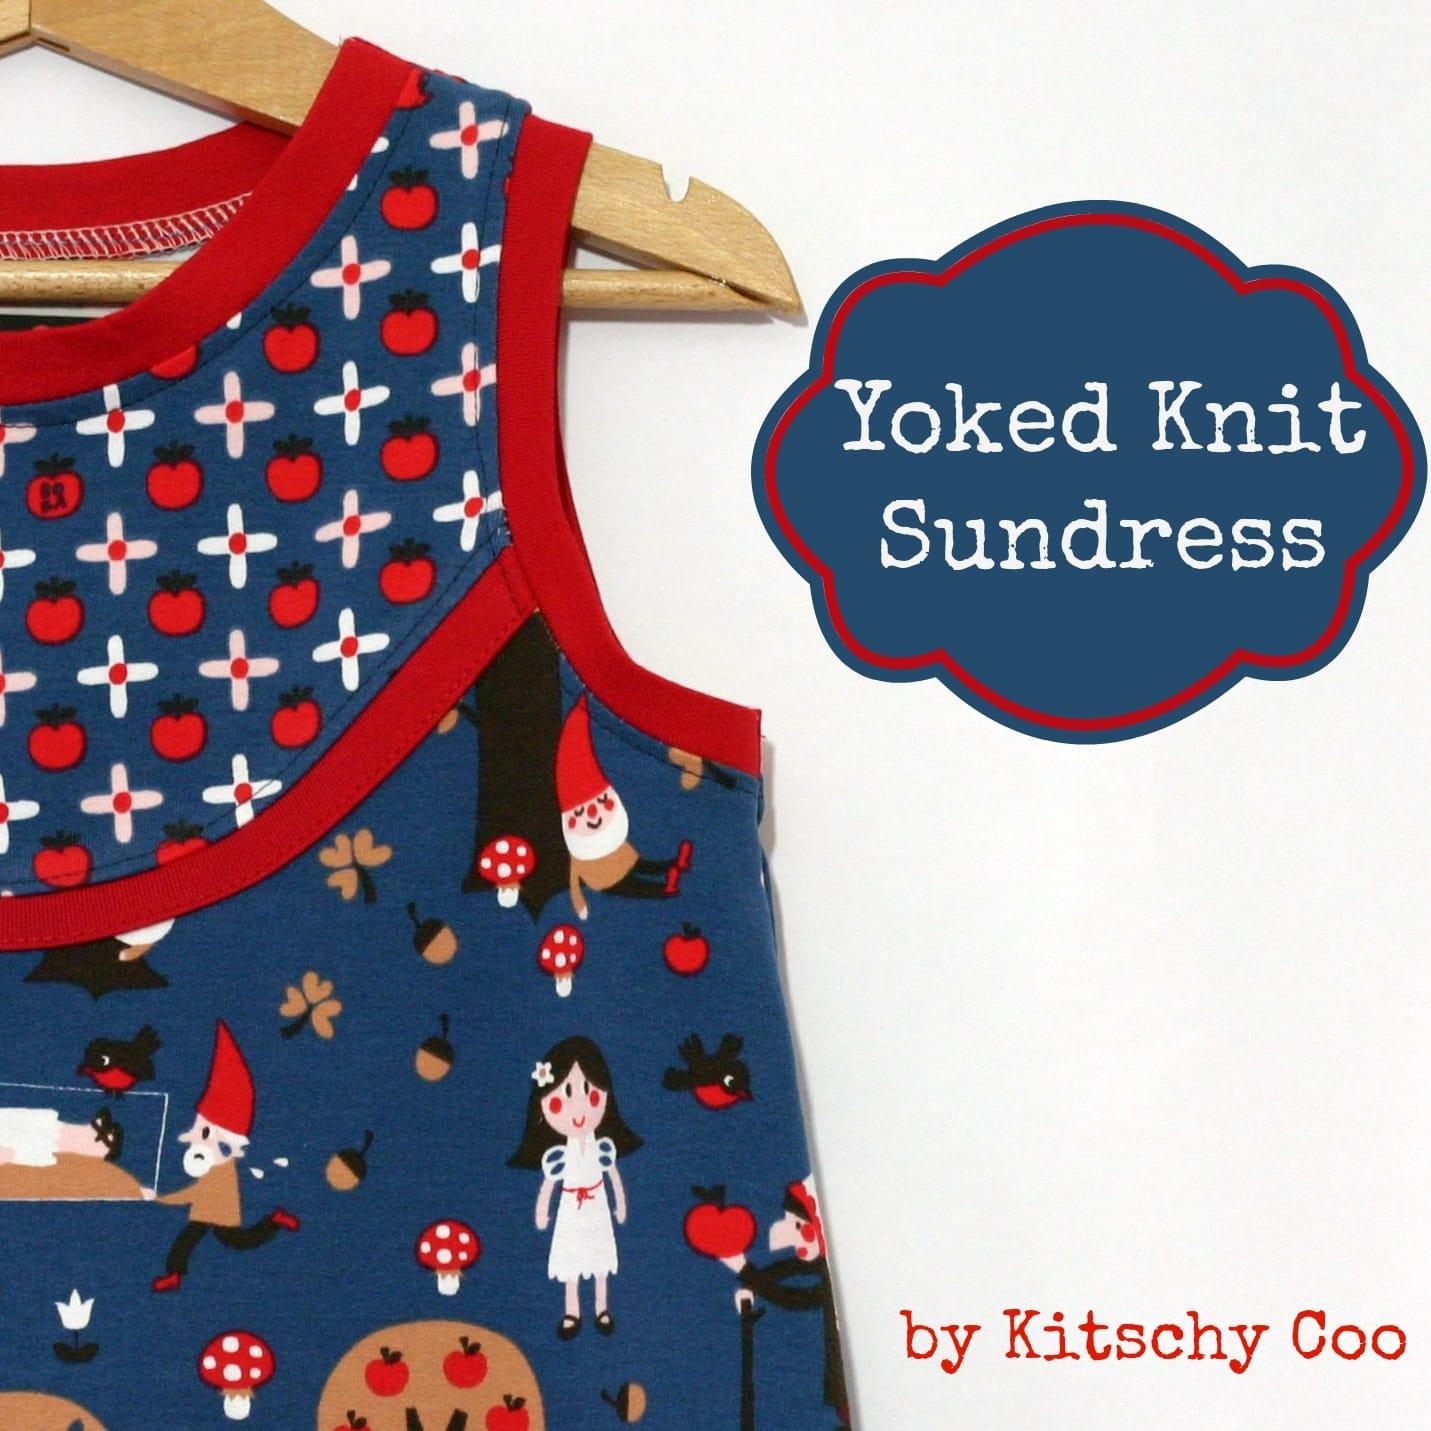 yoked knit sundress teaser